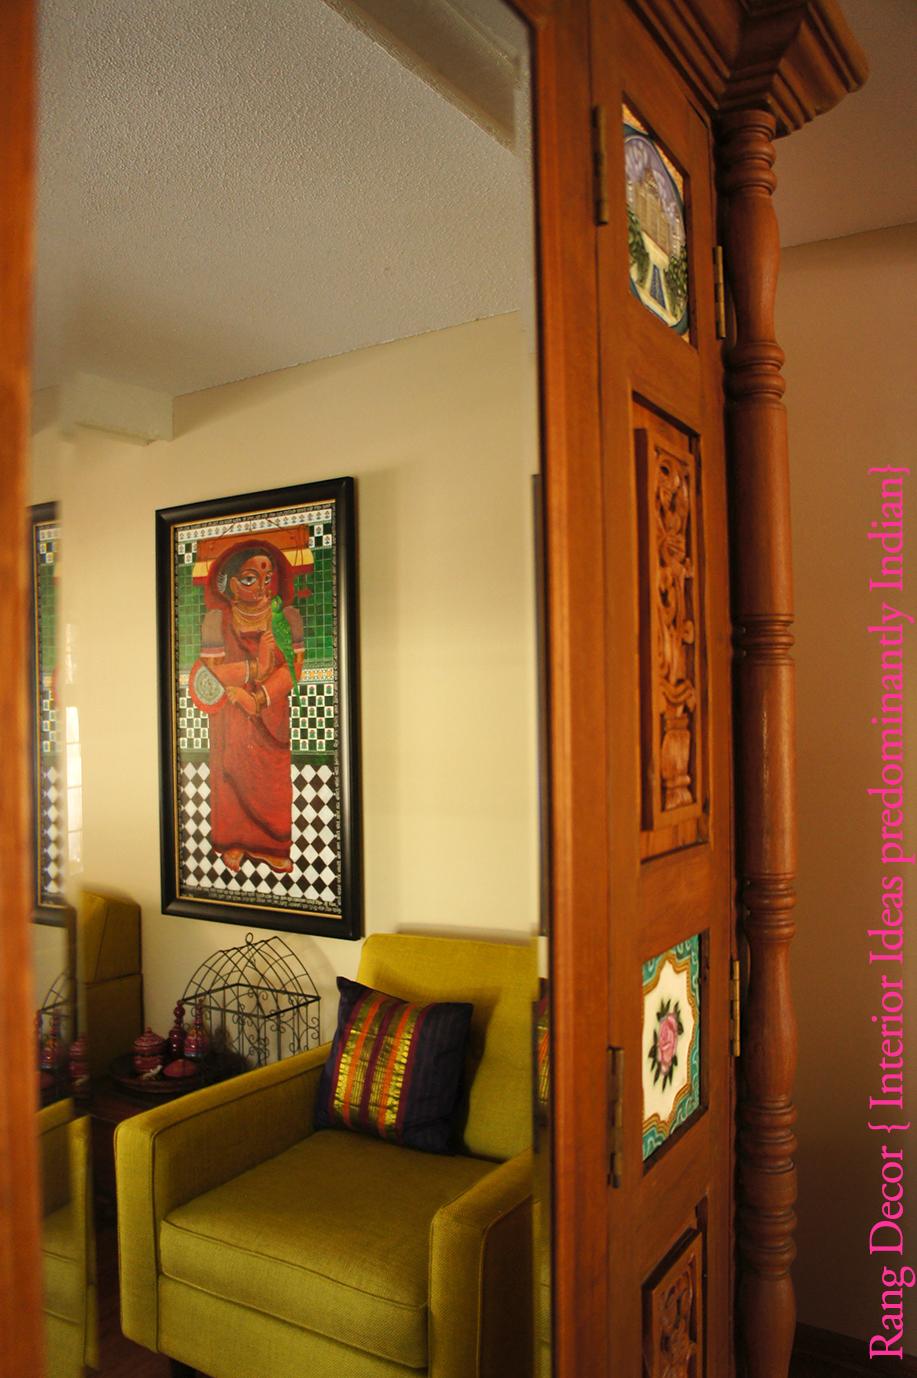 rang decor interior ideas predominantly indian she came home on mahalaya. Black Bedroom Furniture Sets. Home Design Ideas